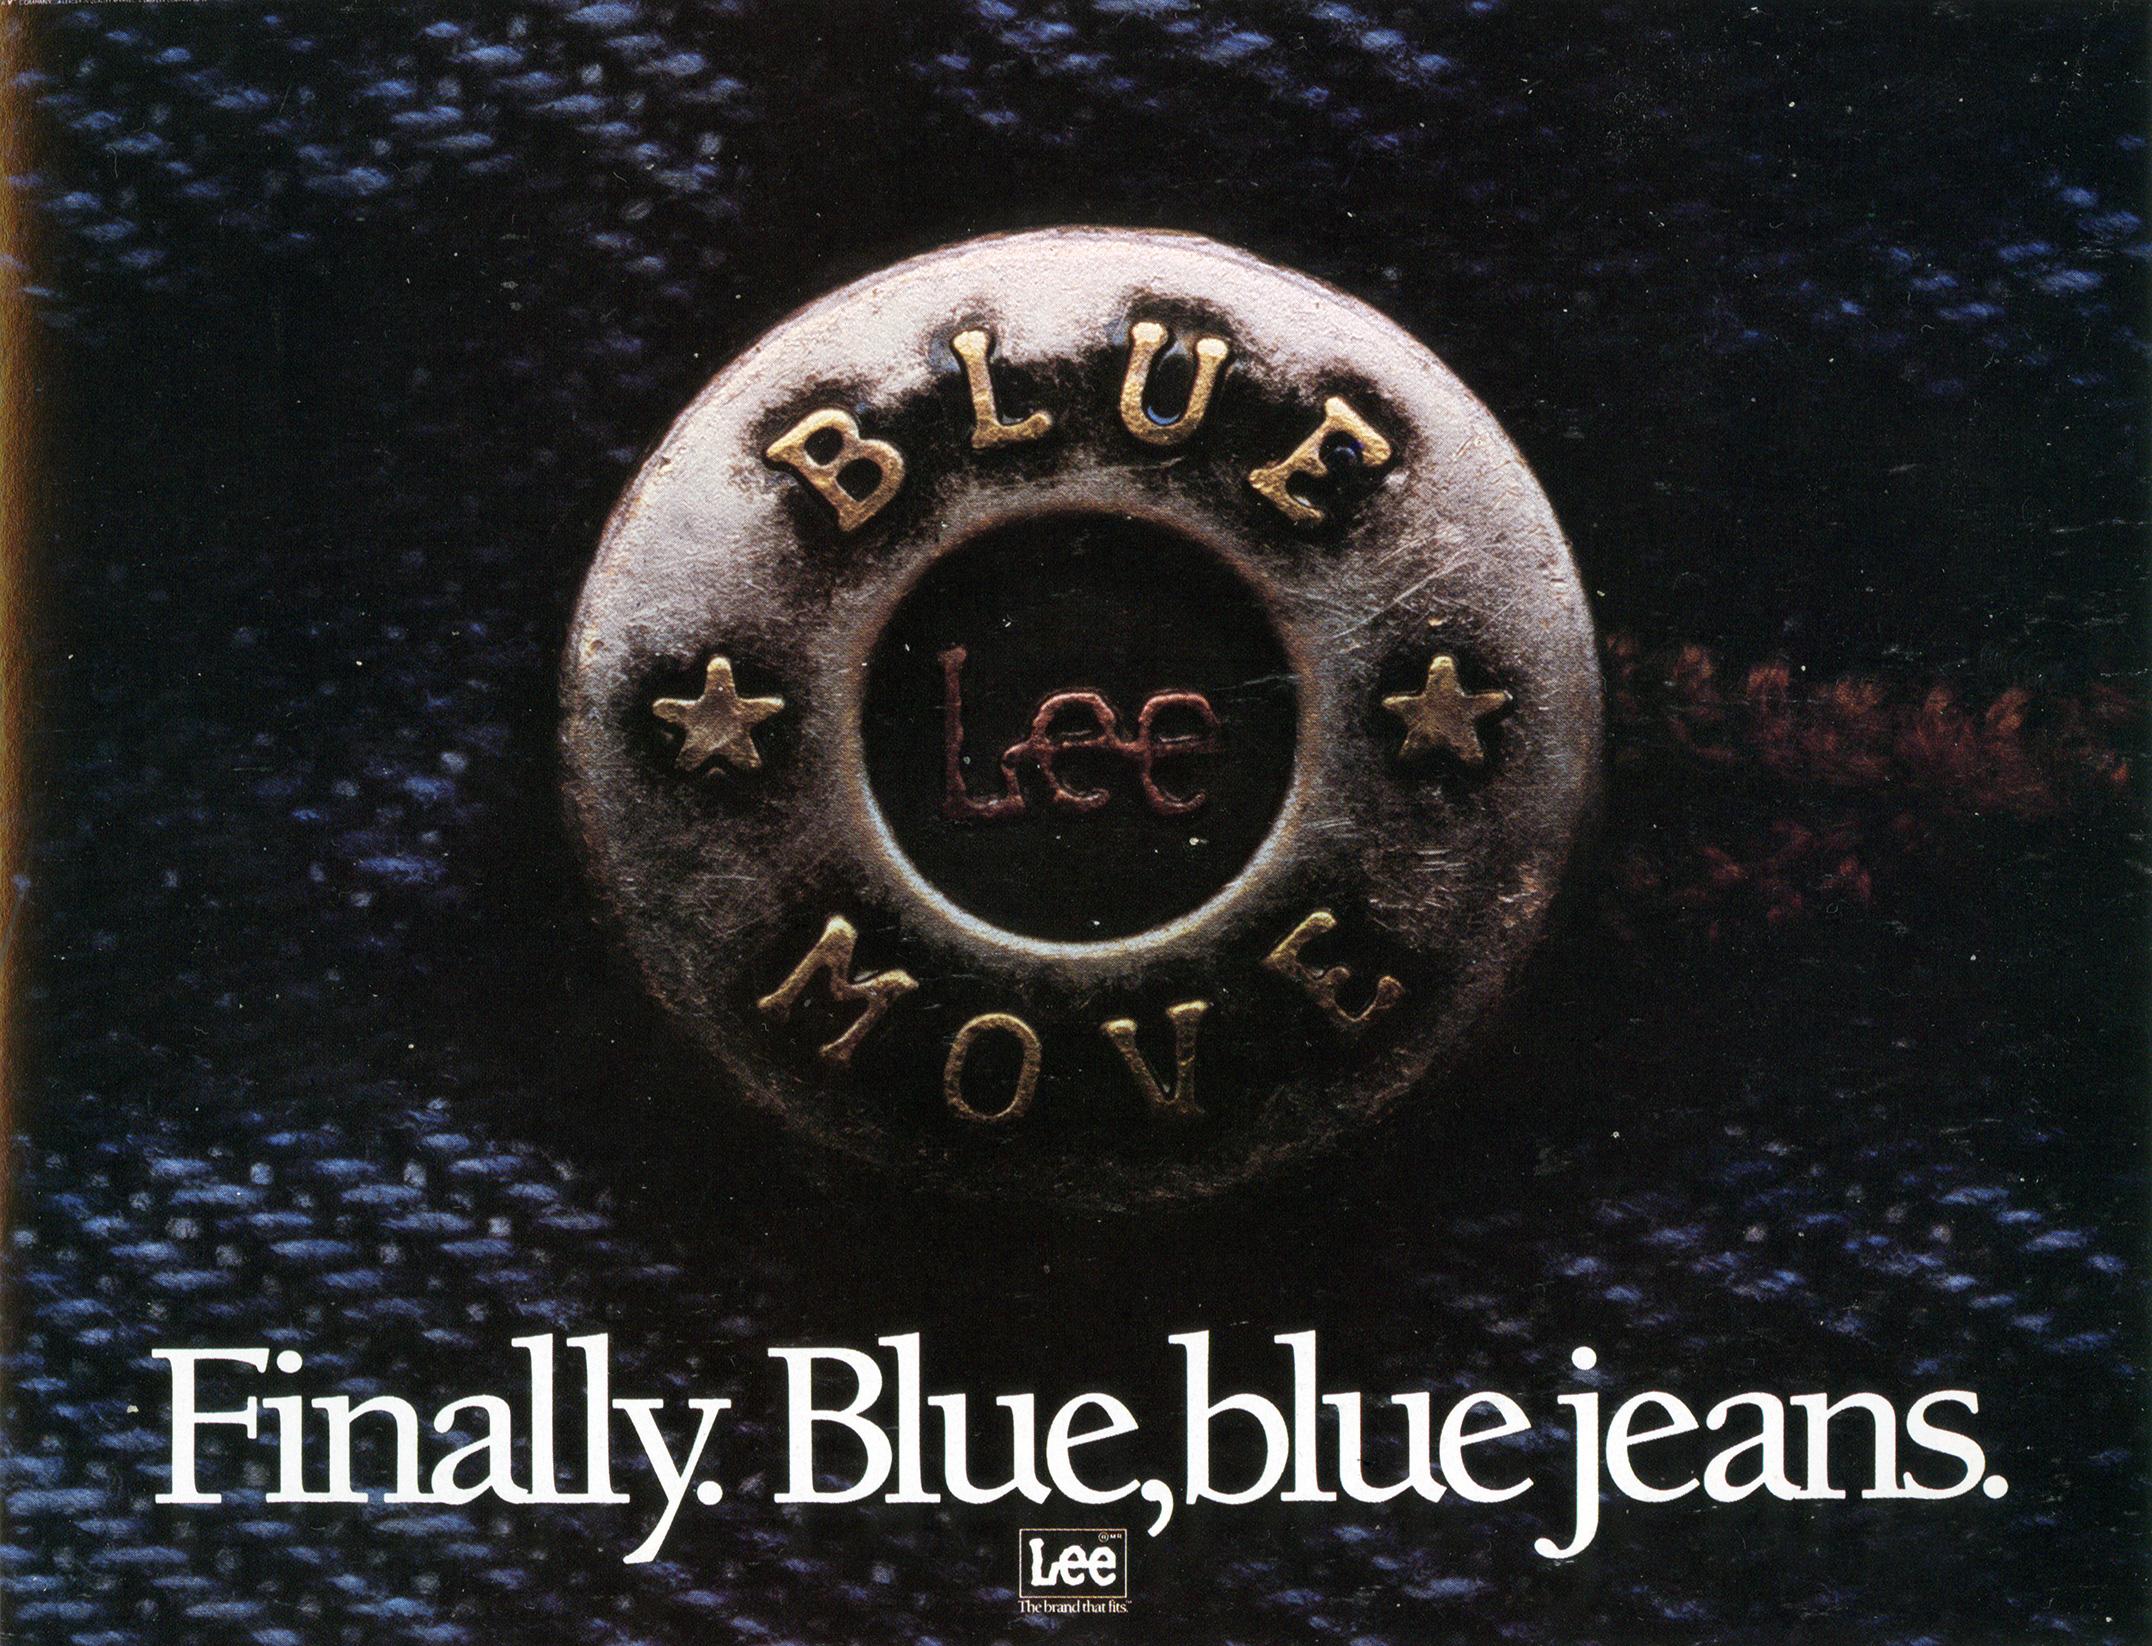 Tom McElligott, Lee 'Blue, Blue'-01